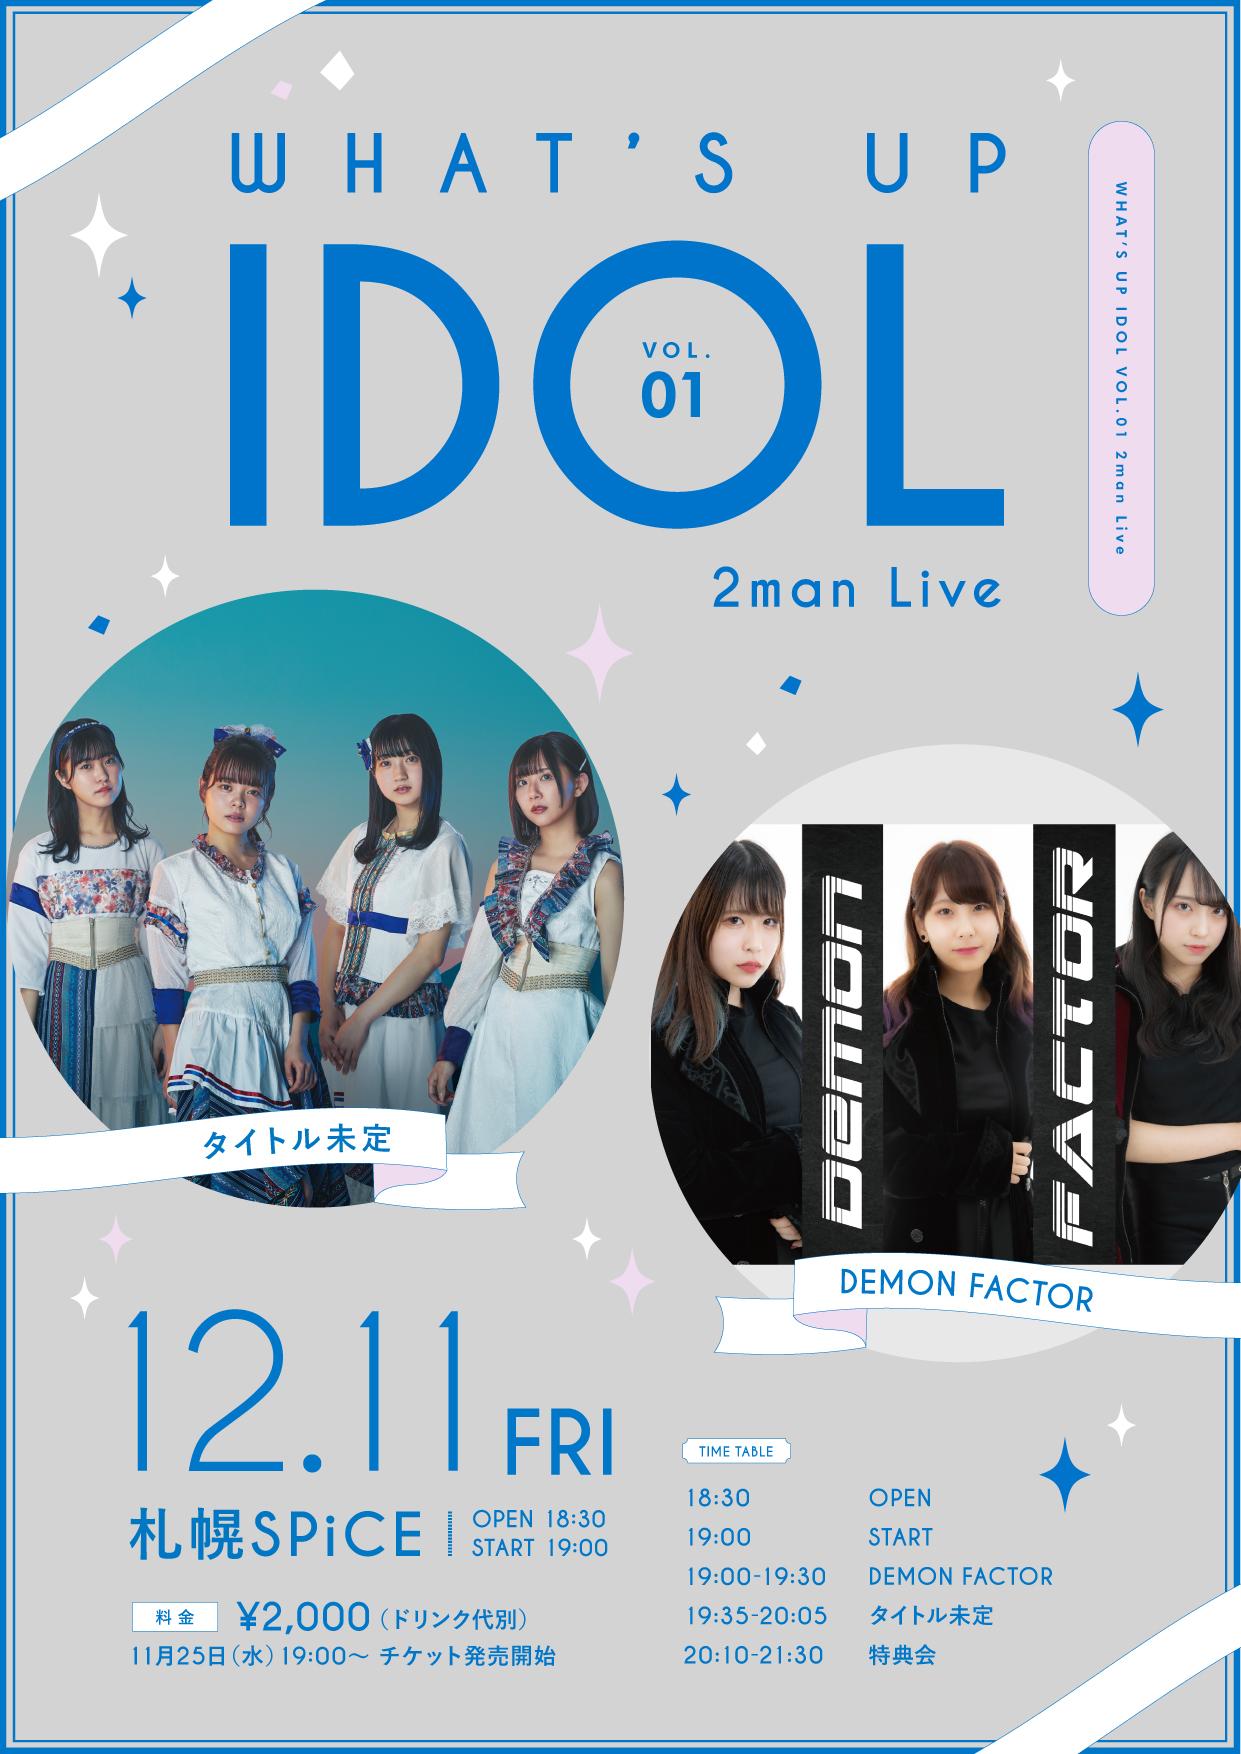 WHAT'S UP IDOL Vol.1 2man Live